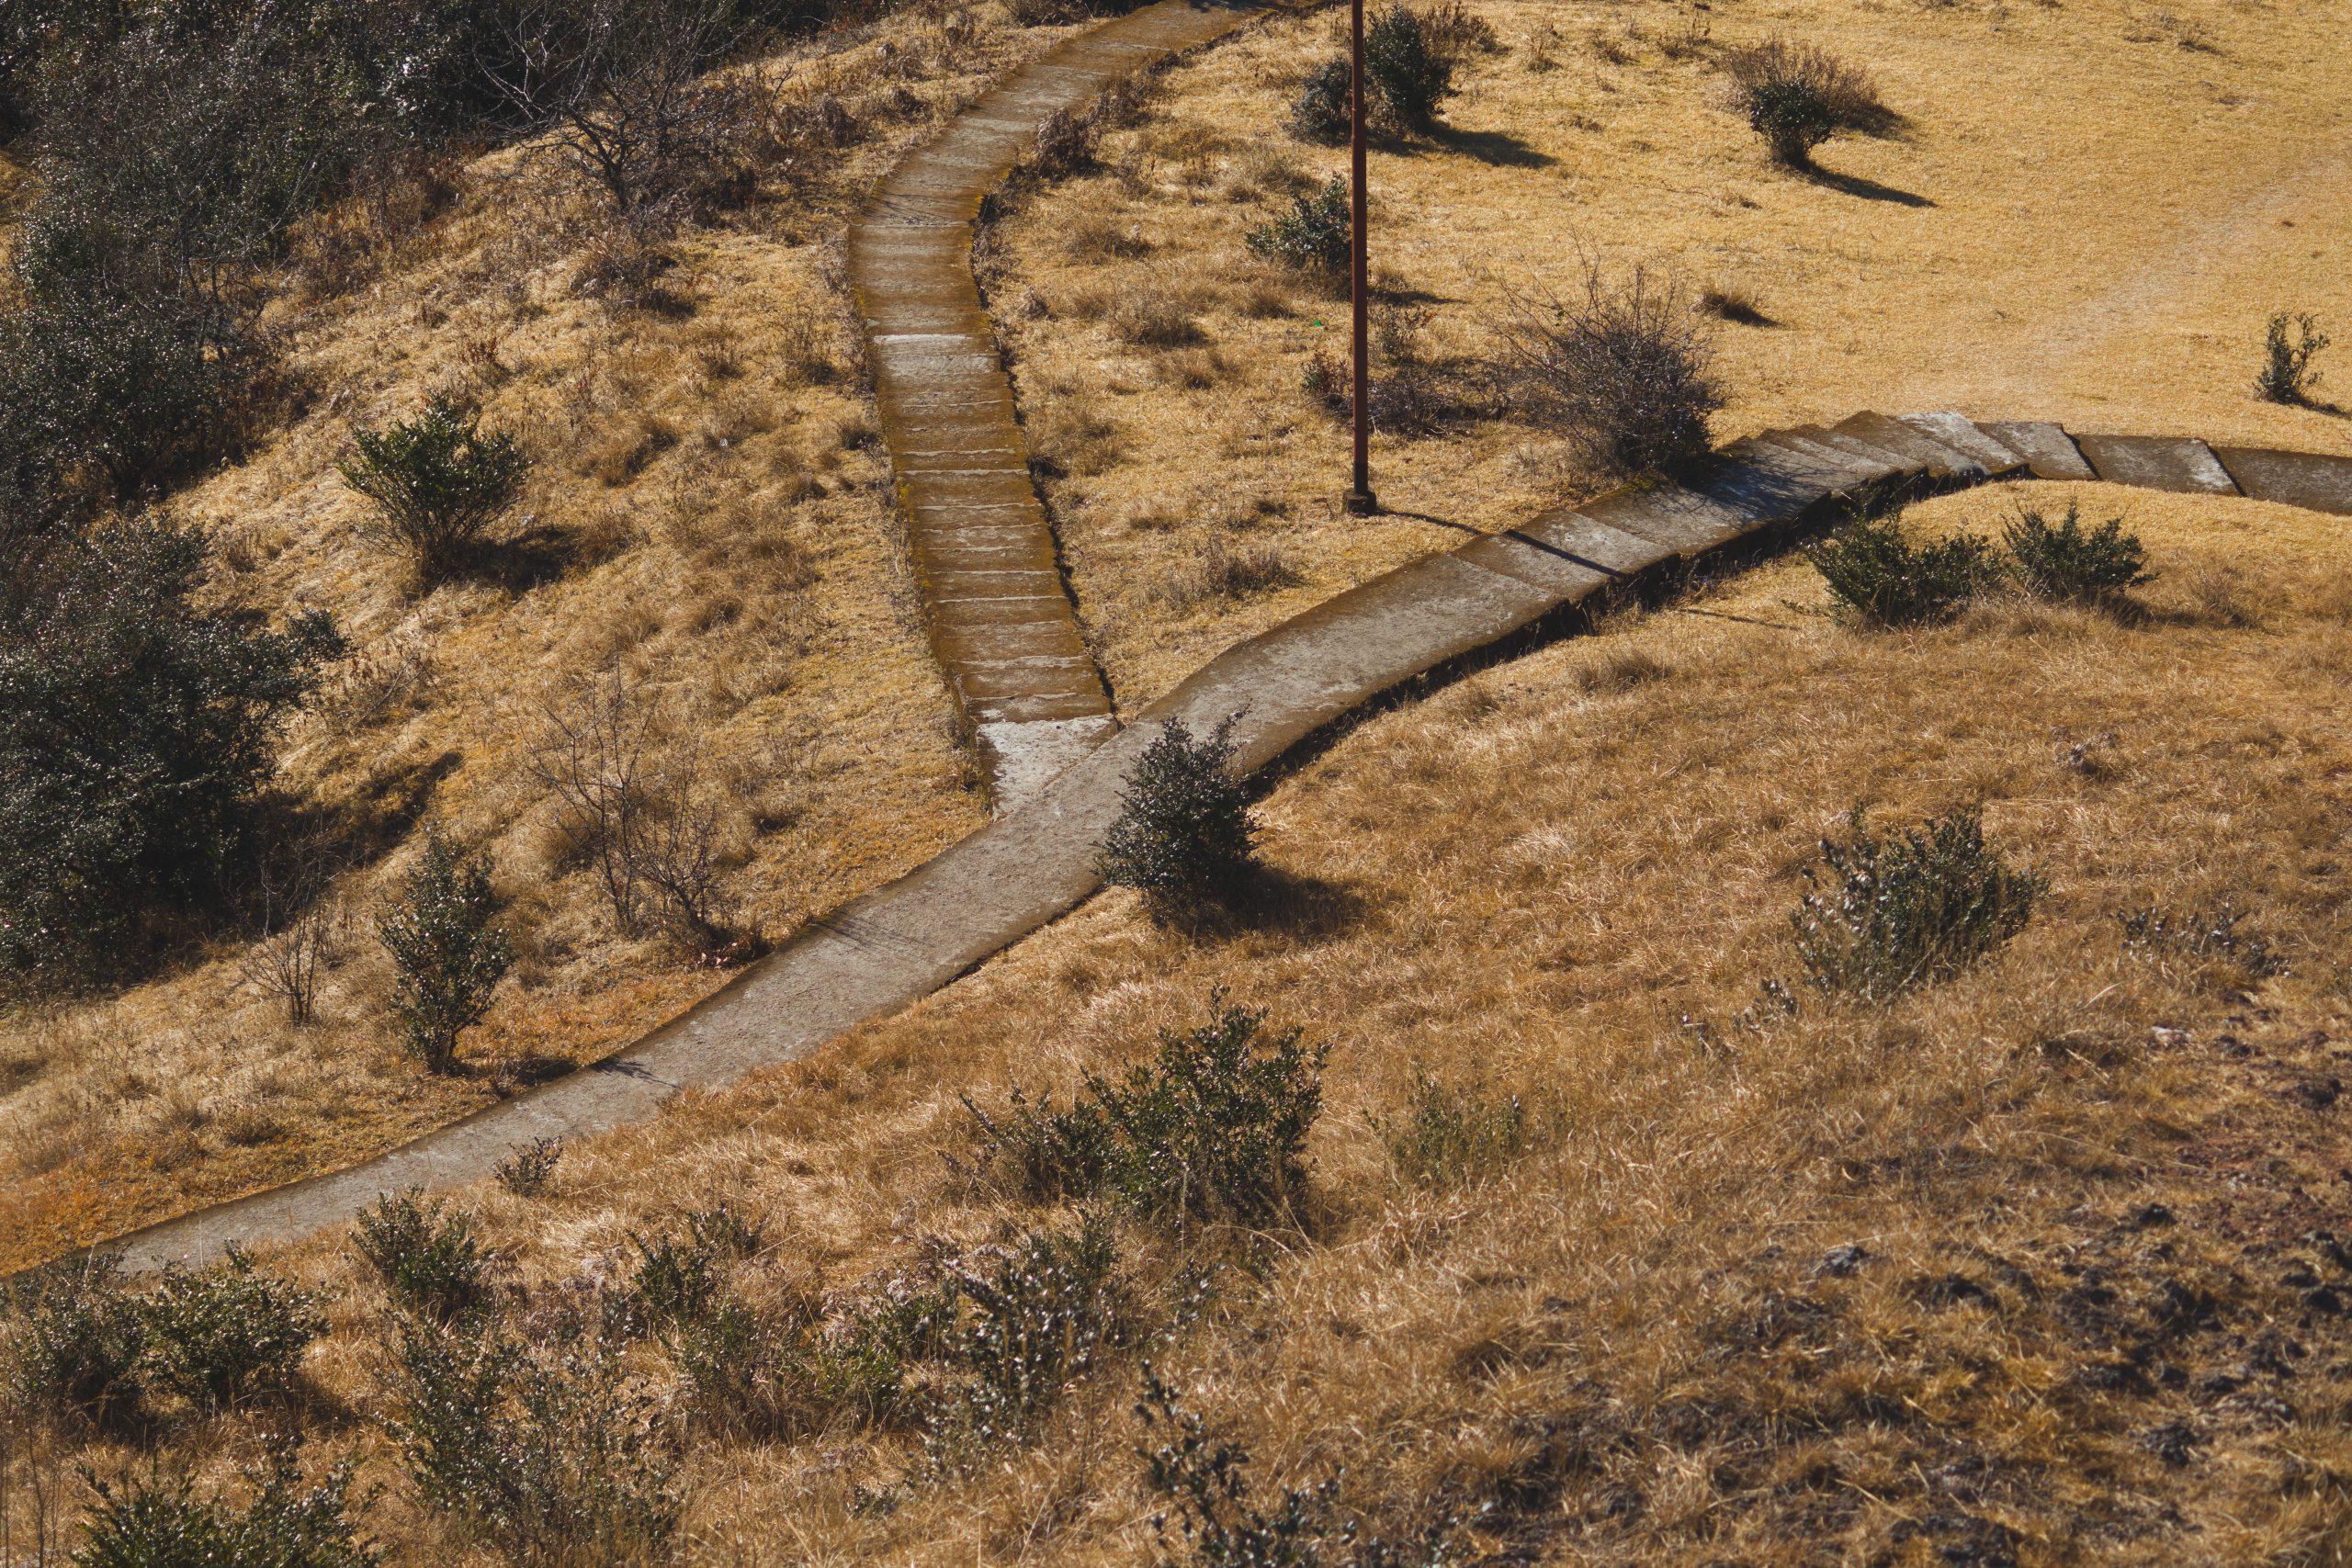 Footpath made on a land